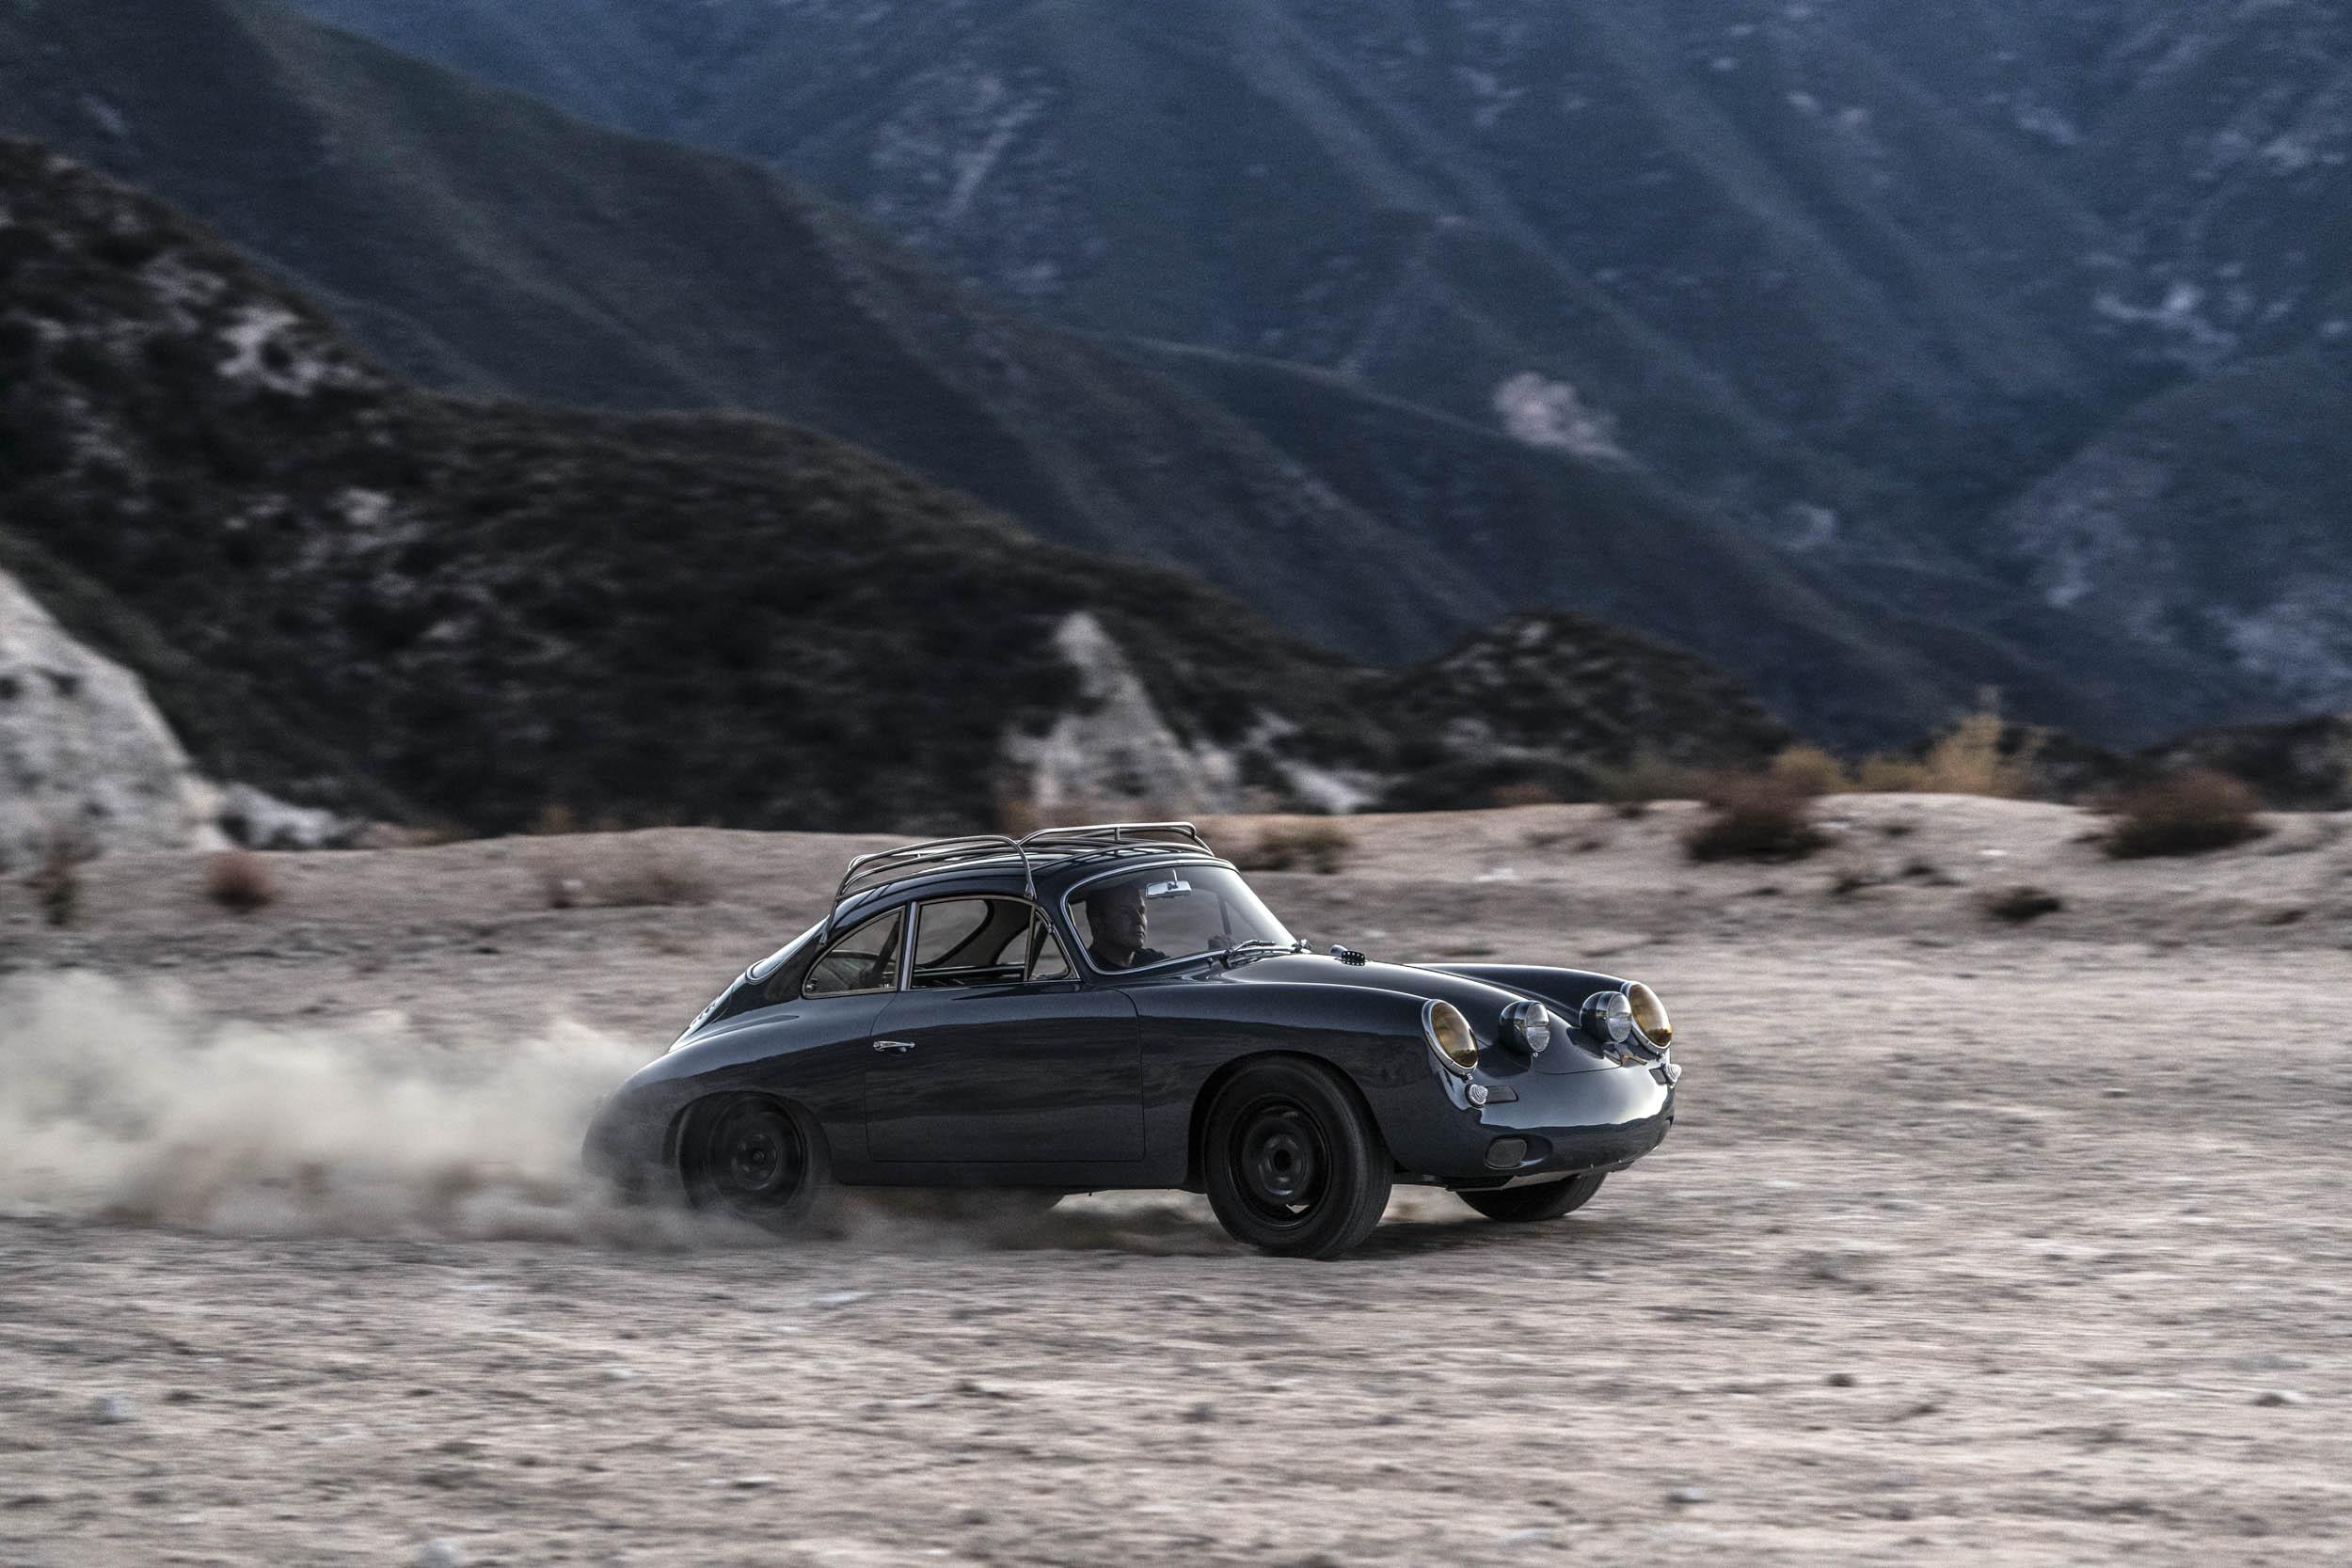 Emory Porsche 356 C4S Allrad driving in dirt